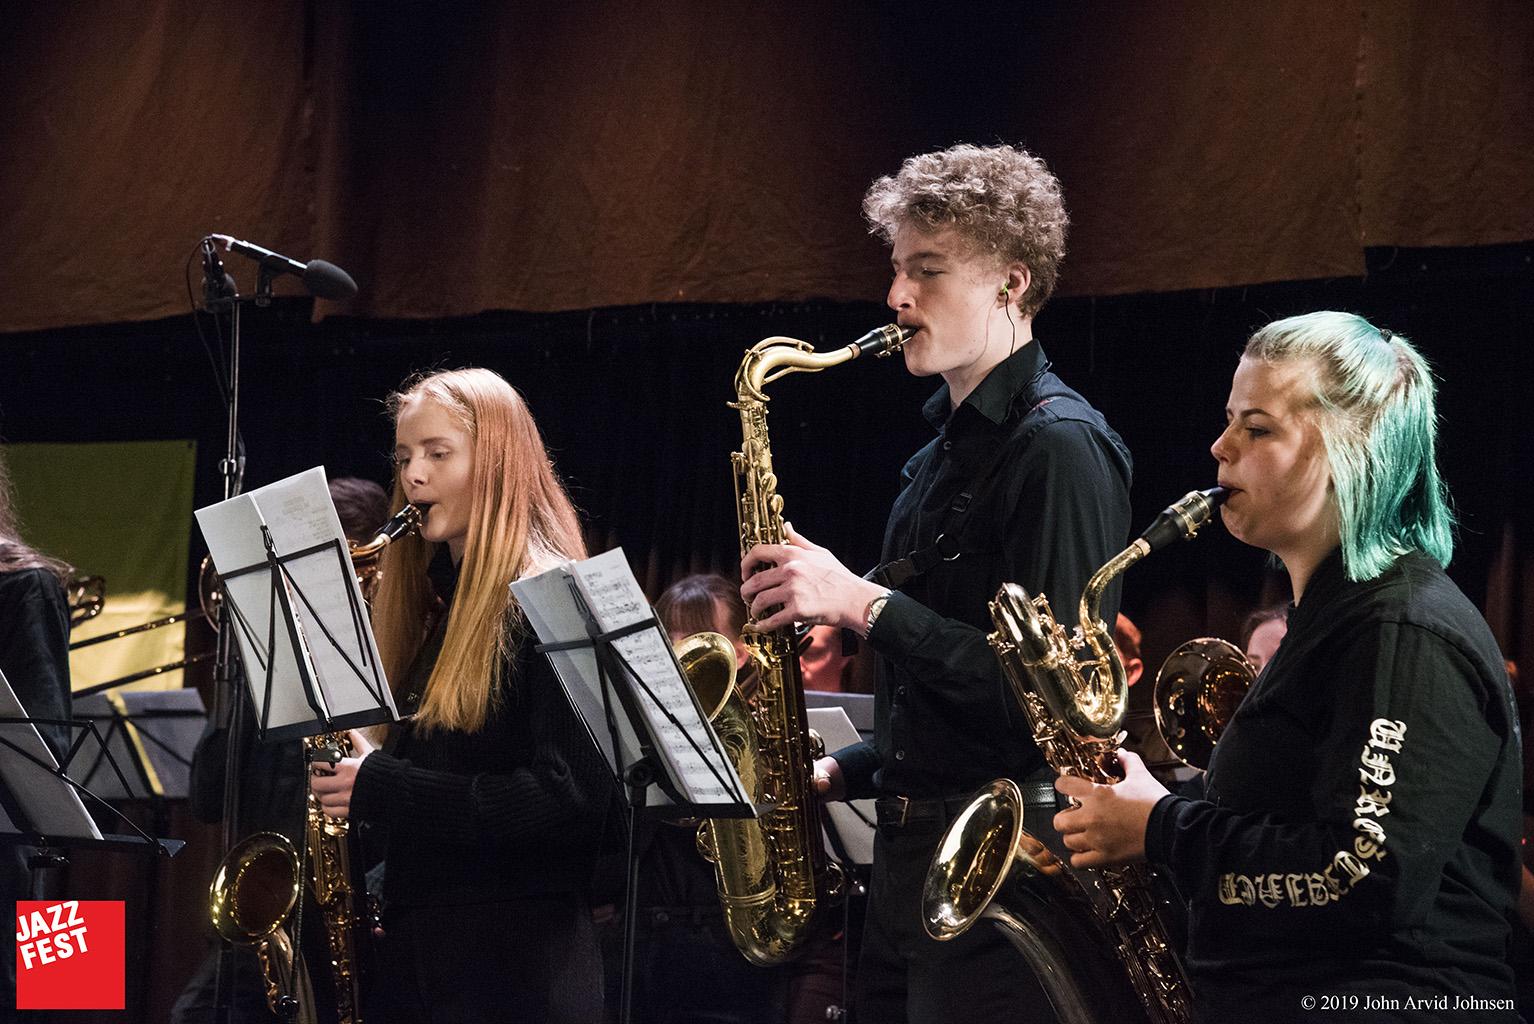 190511 Jazzfest Ung @ Isak Kultursenter (foto John Arvid Johnsen) _ 1.jpg